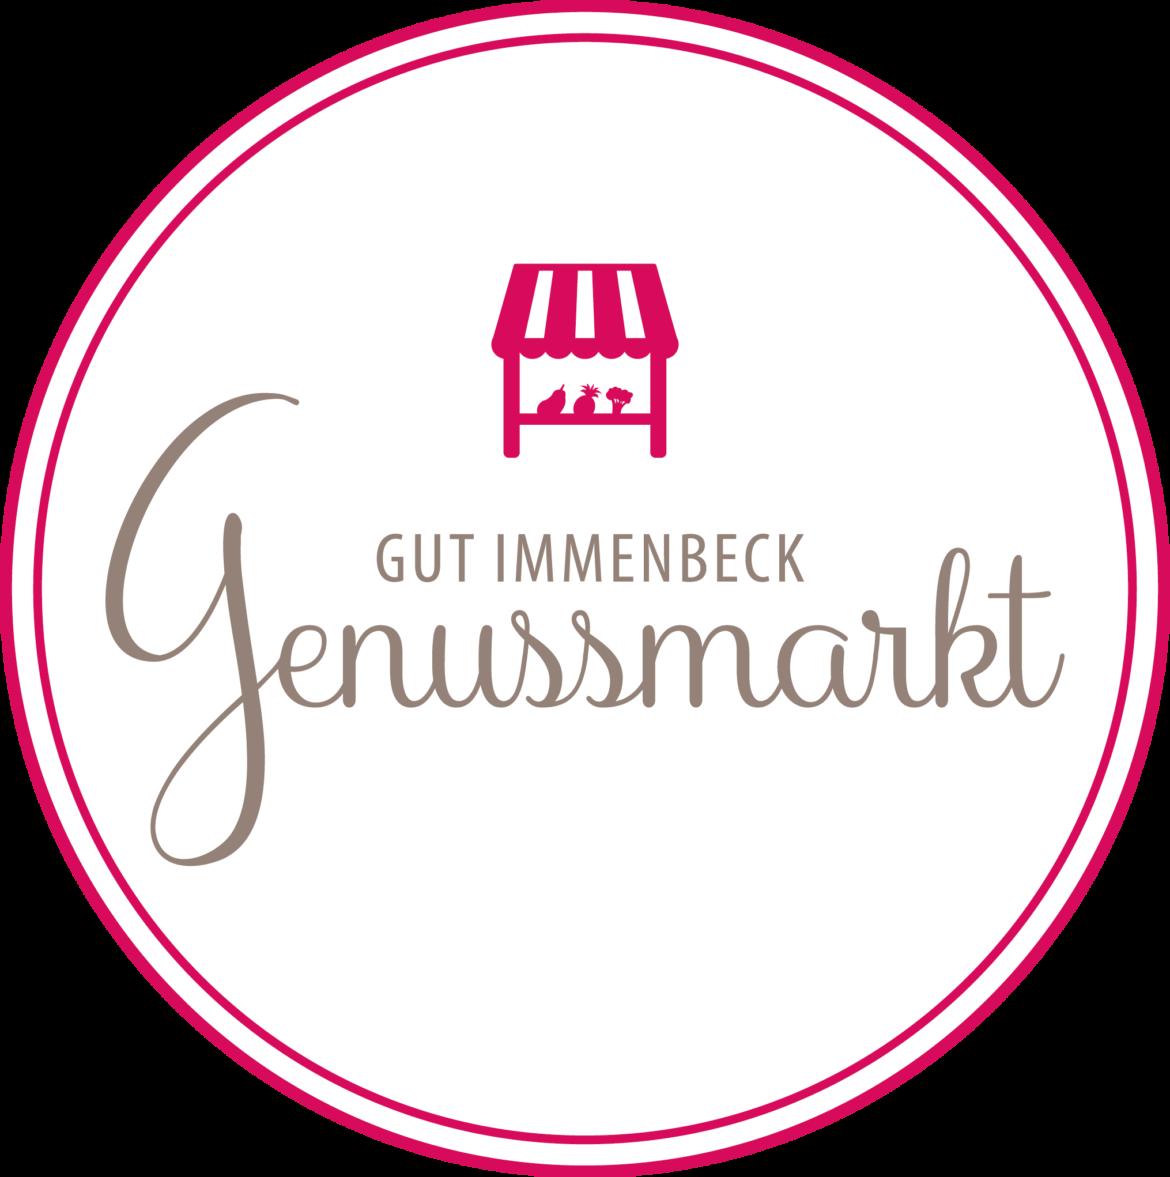 Logo-Genussmarkt-Kreis-Farbe.png